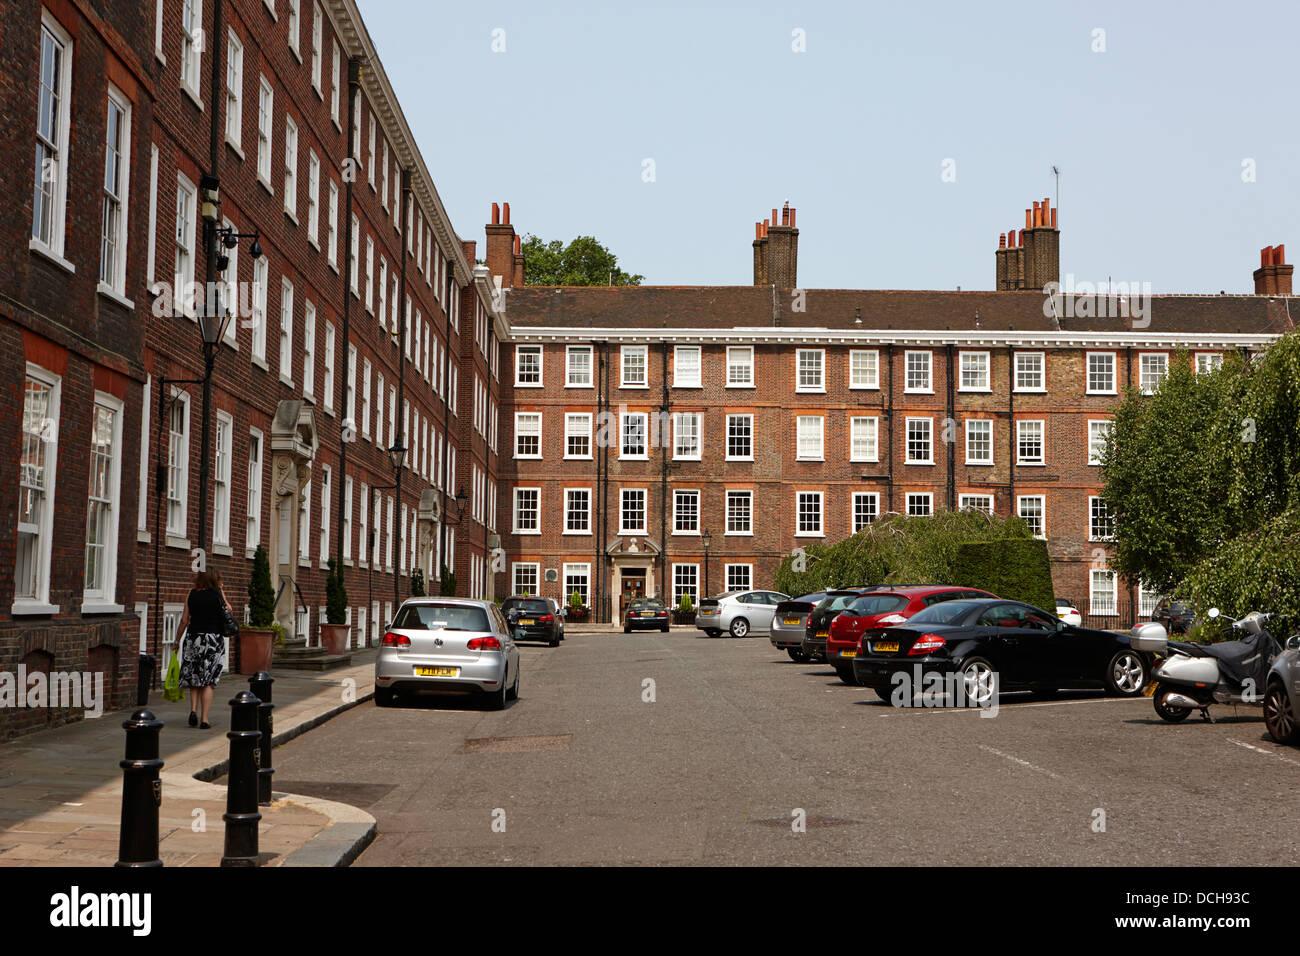 grays inn square London England UK - Stock Image